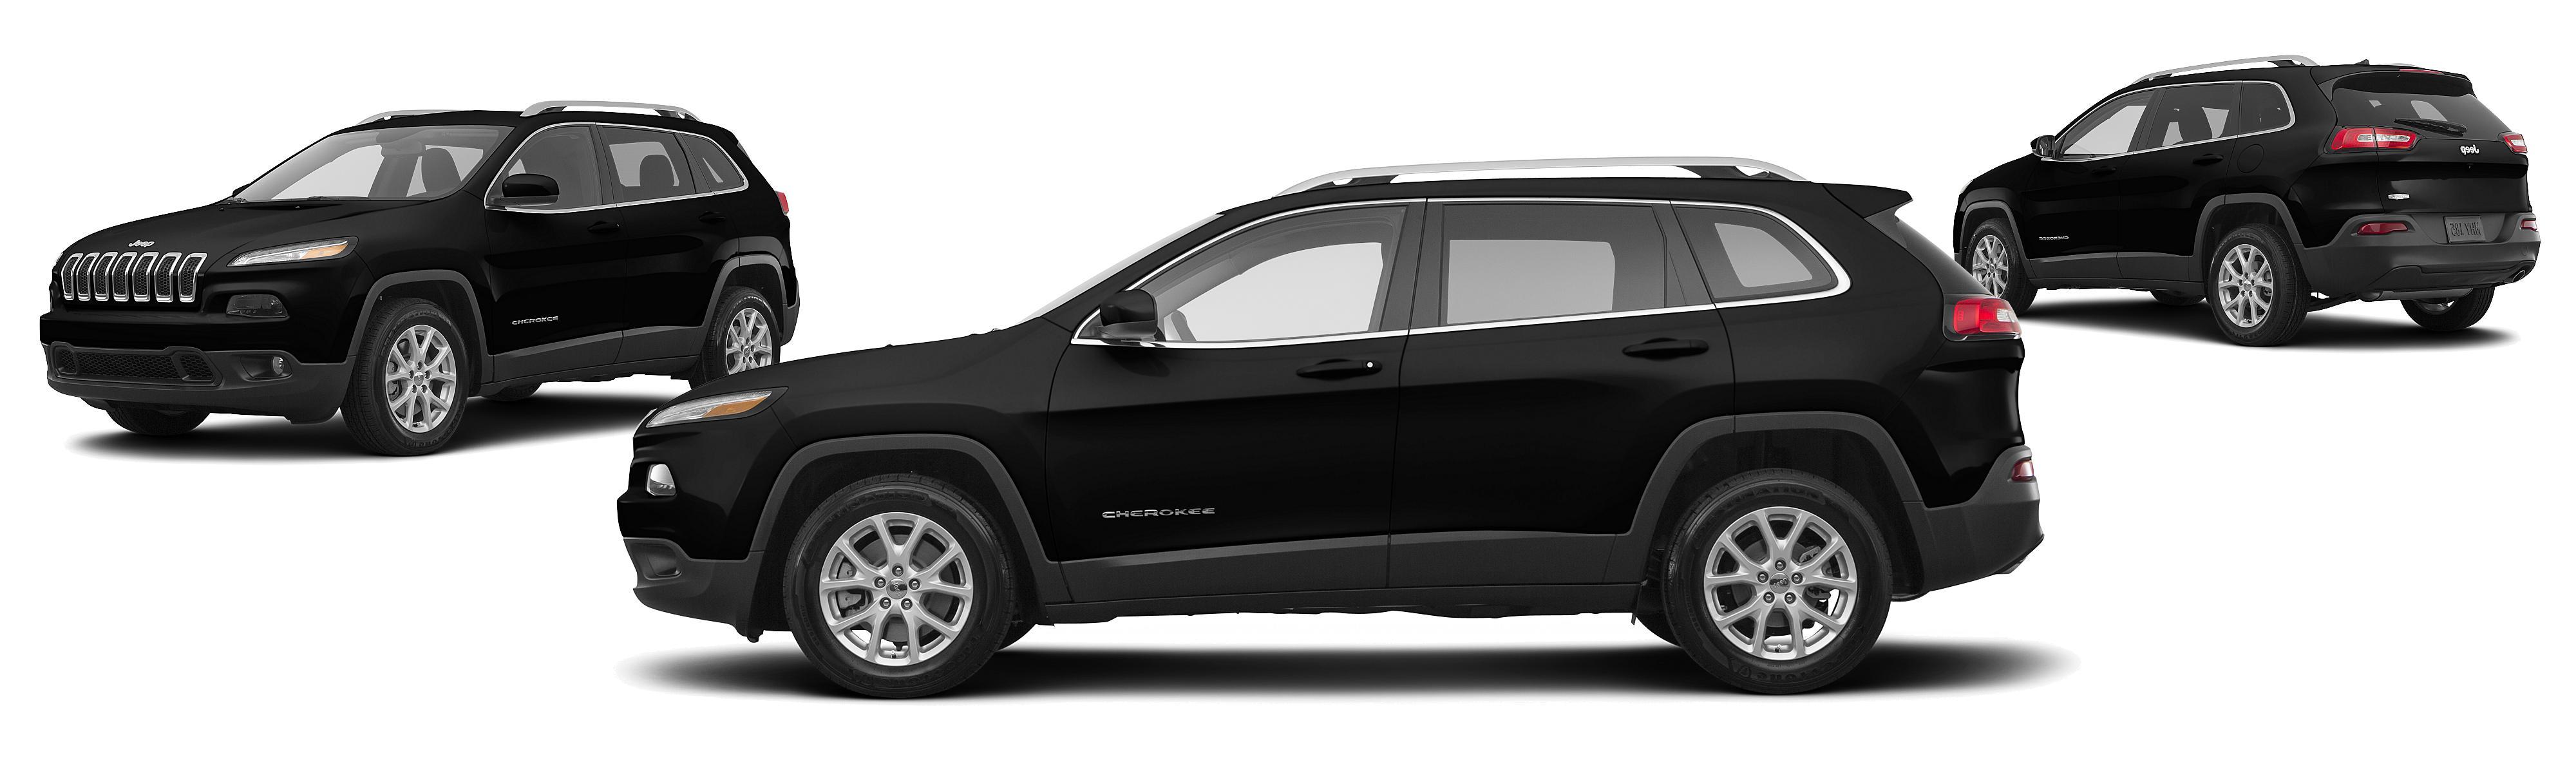 dealer sport utility cortland serving inventory cherokee new latitude jeep price binghamton plus htm